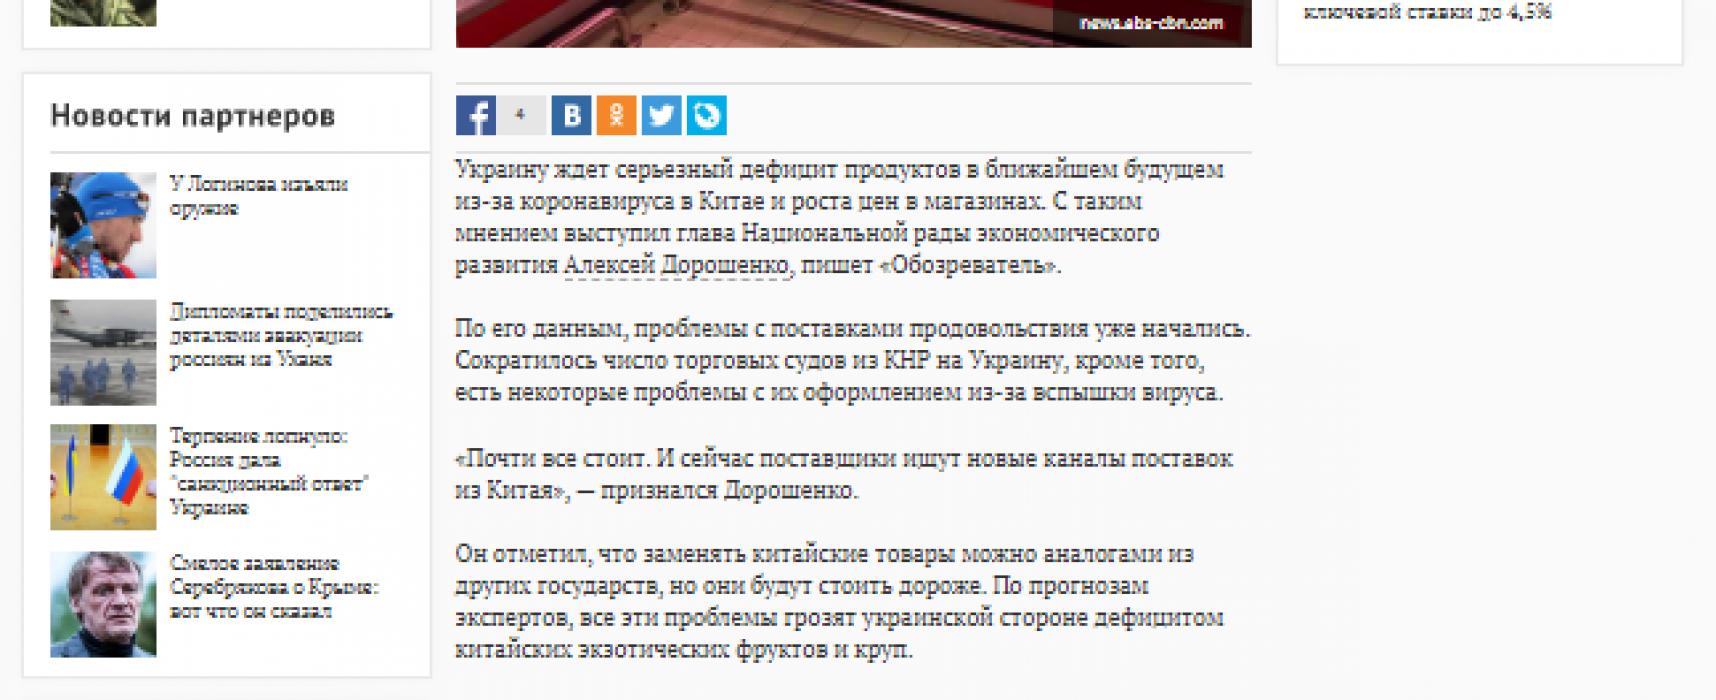 Fake: Coronavirus to Bring Food Shortages in Ukraine